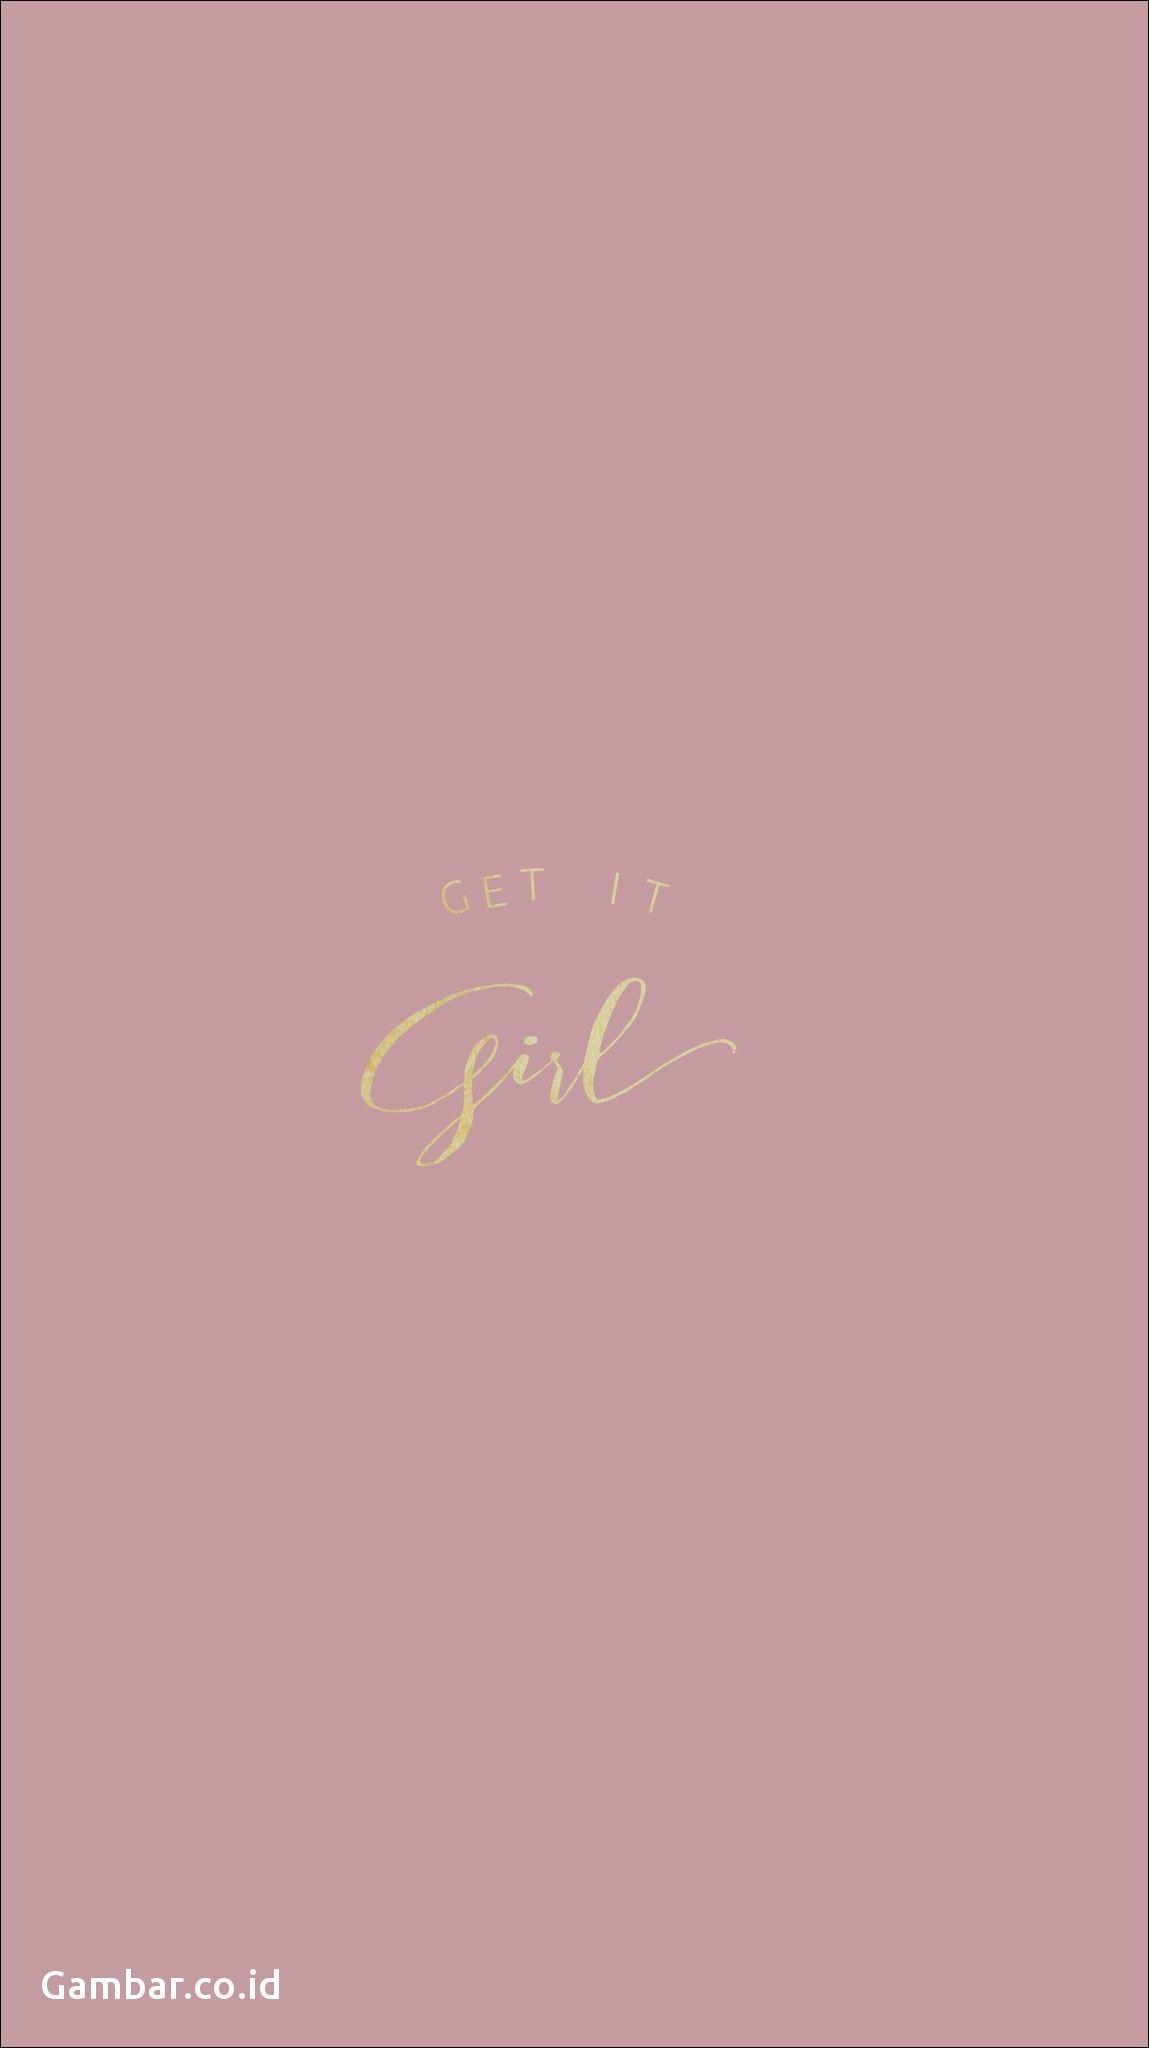 Wallpaper Tumblr Pink In 2020 Gold Wallpaper Iphone Glitter